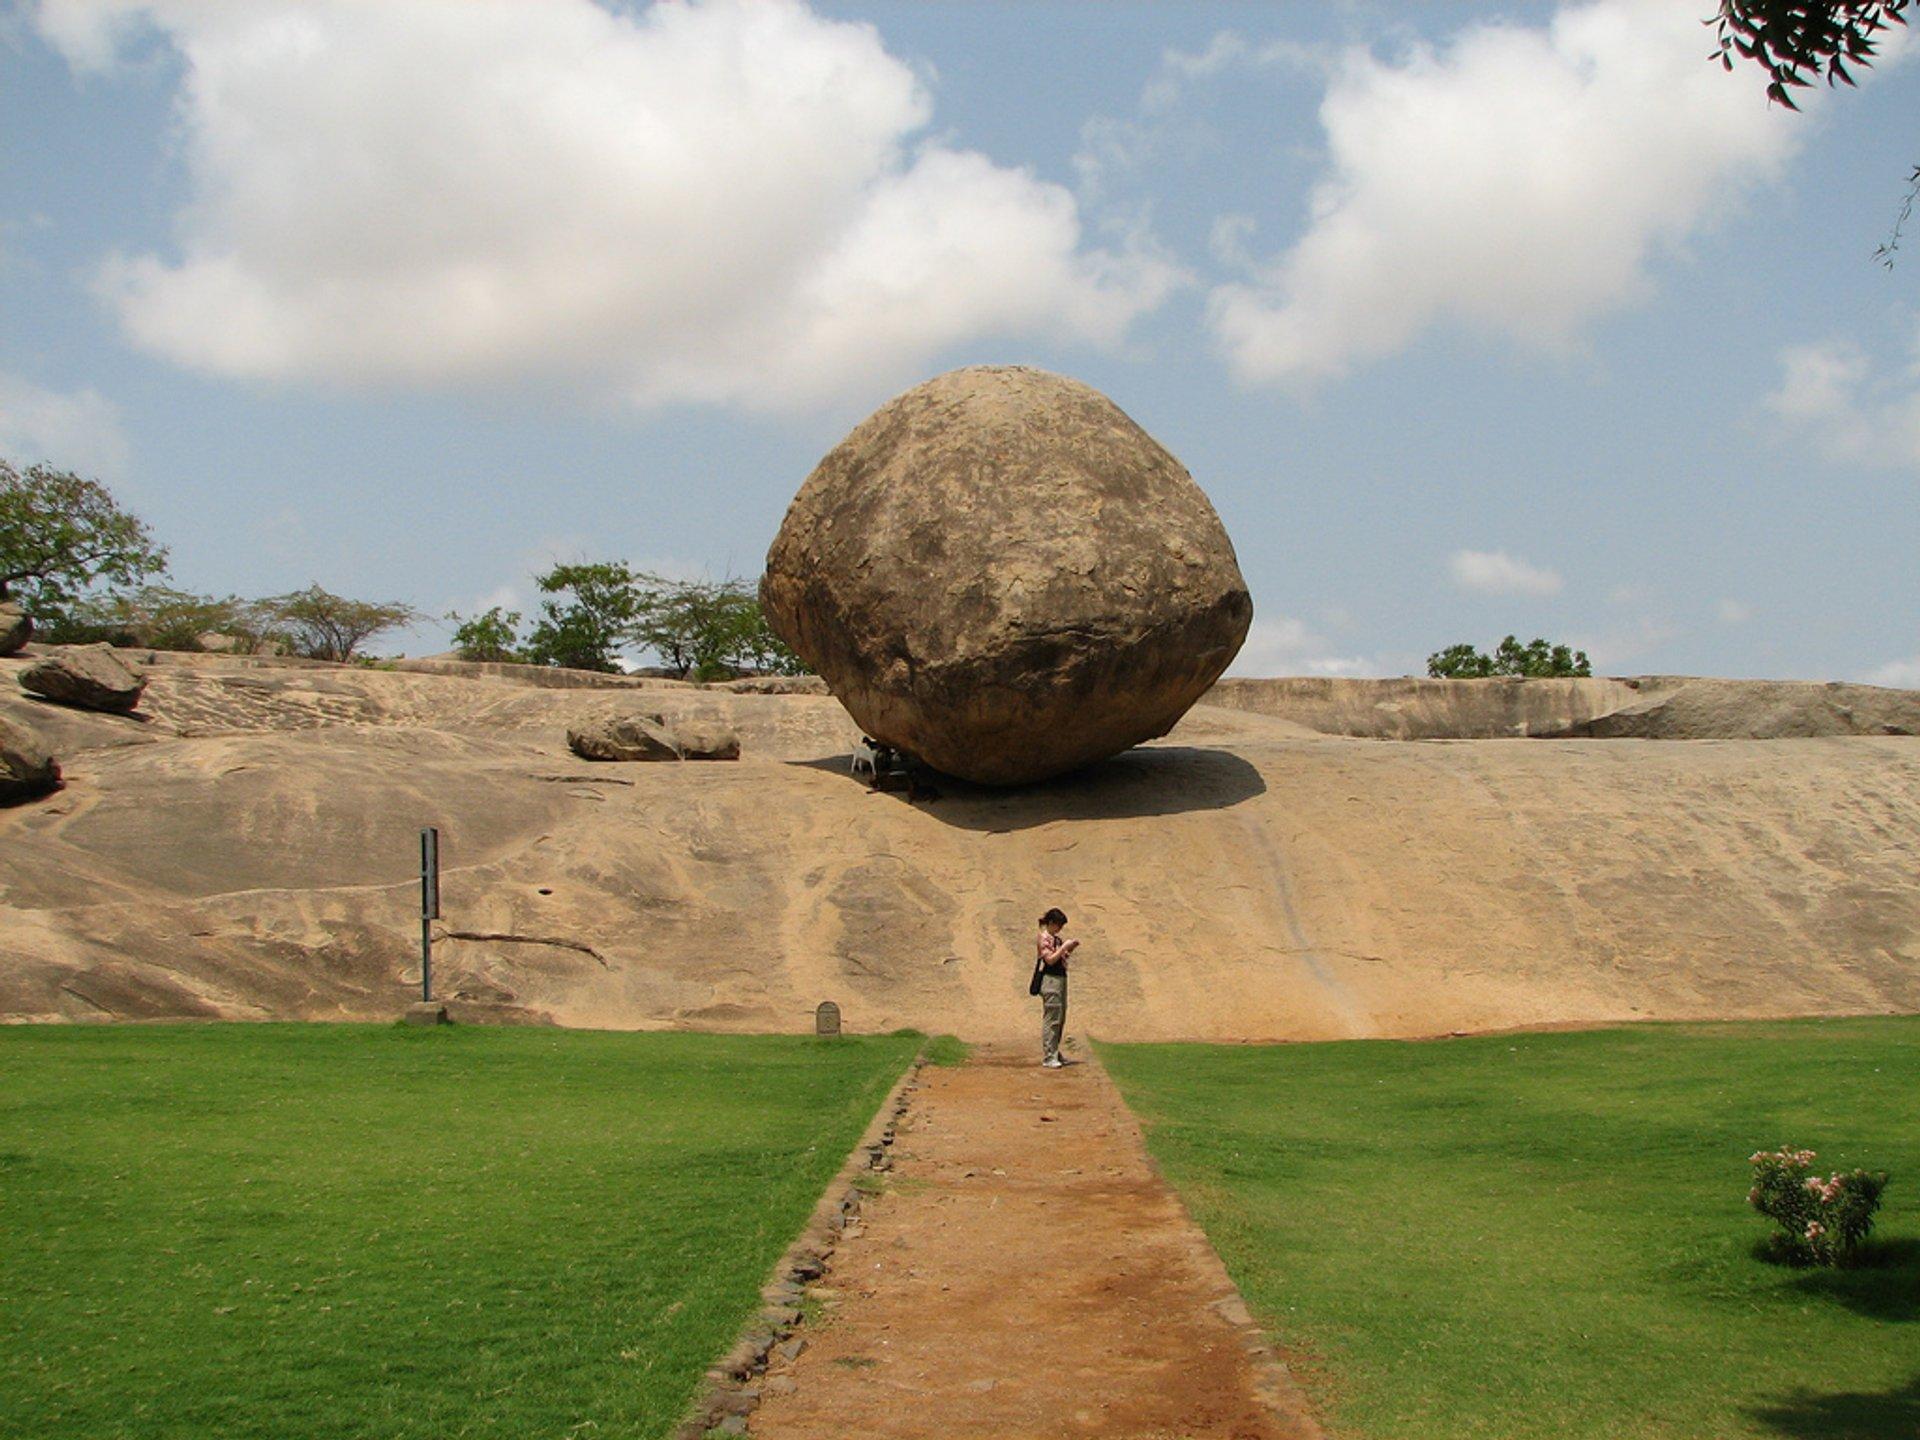 Krishna's Butter Ball in India - Best Season